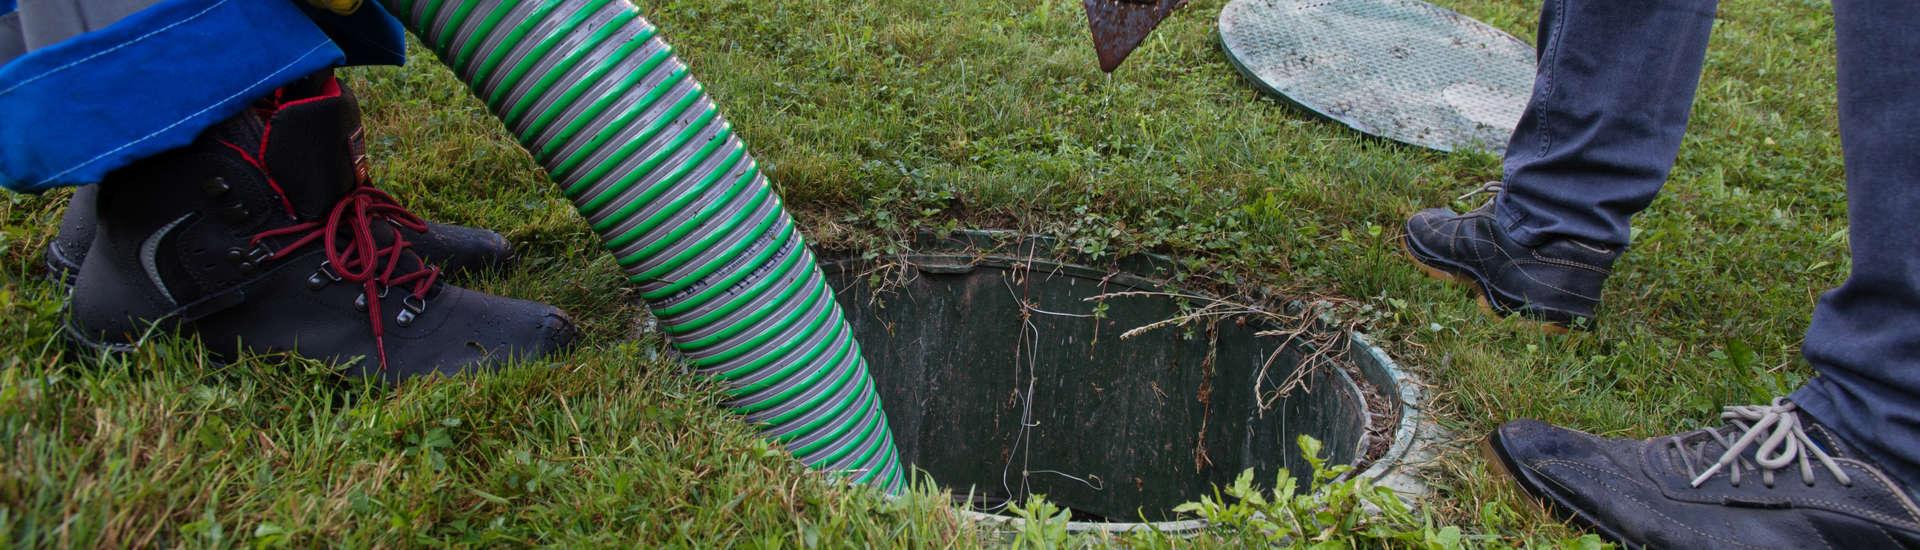 Sewer Cleaning Chenoa IL